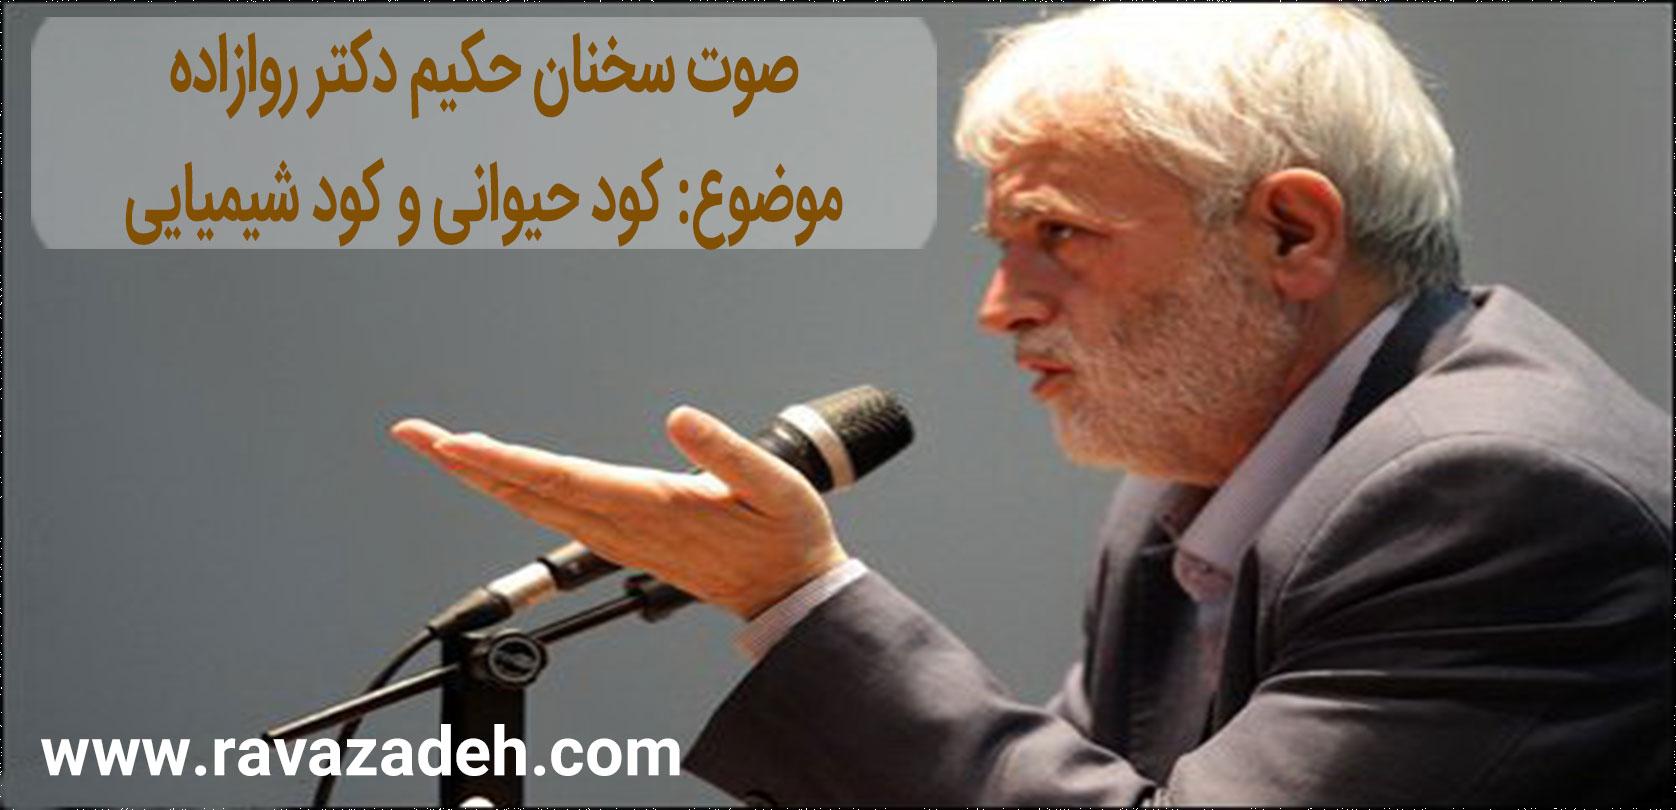 Photo of سخنرانی حکیم دکتر روازاده: با موضوع کود حیوانی و کود شیمیایی